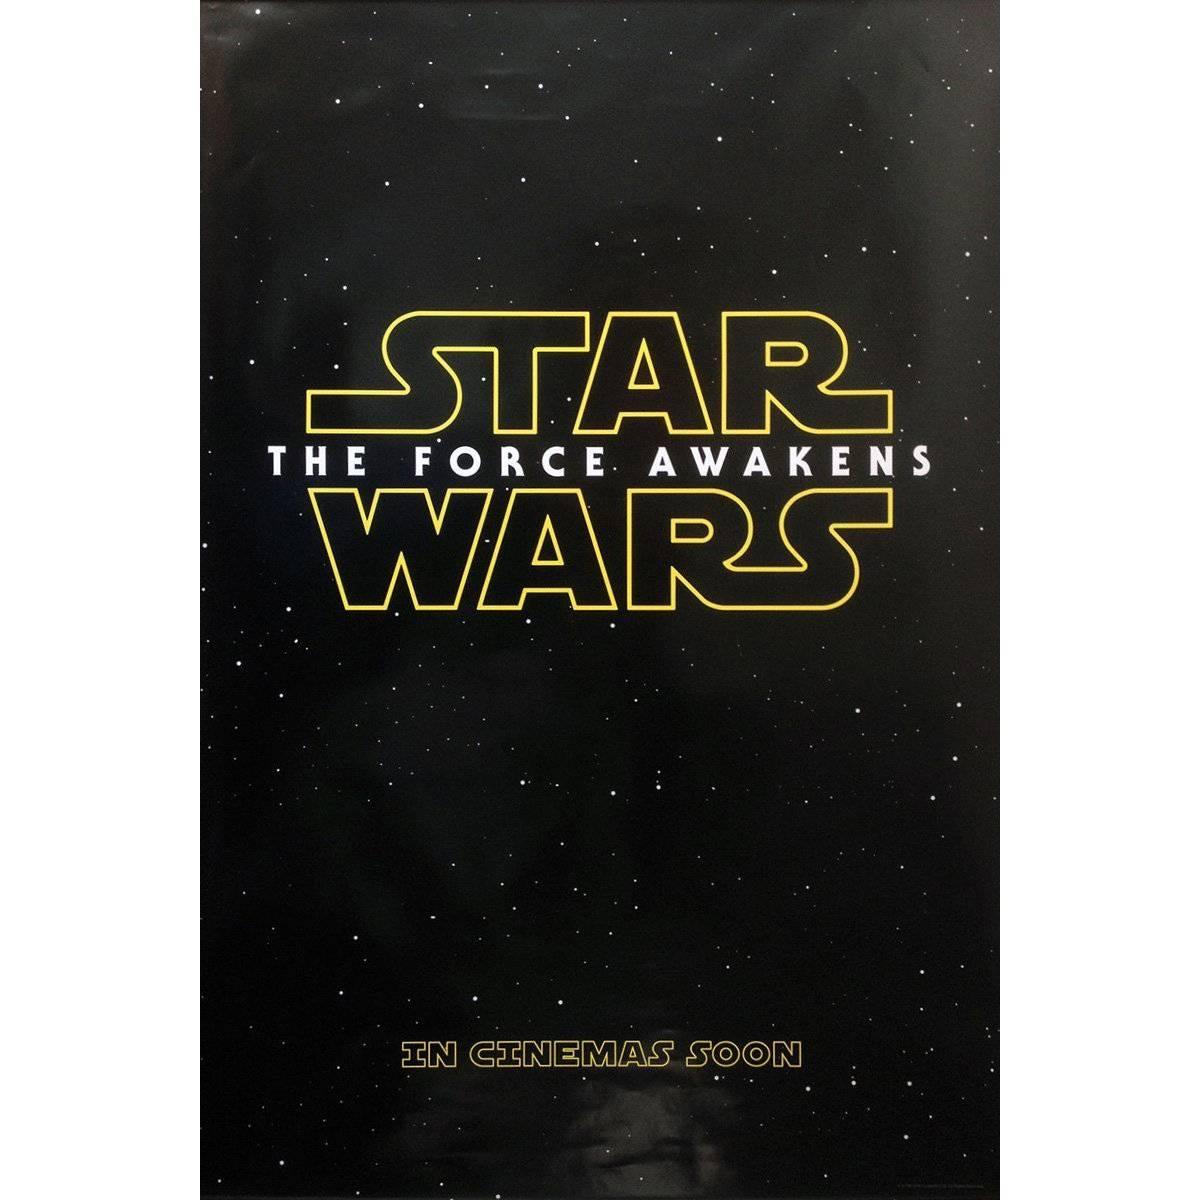 """Star Wars: The Force Awakens"", Film Poster, 2015"